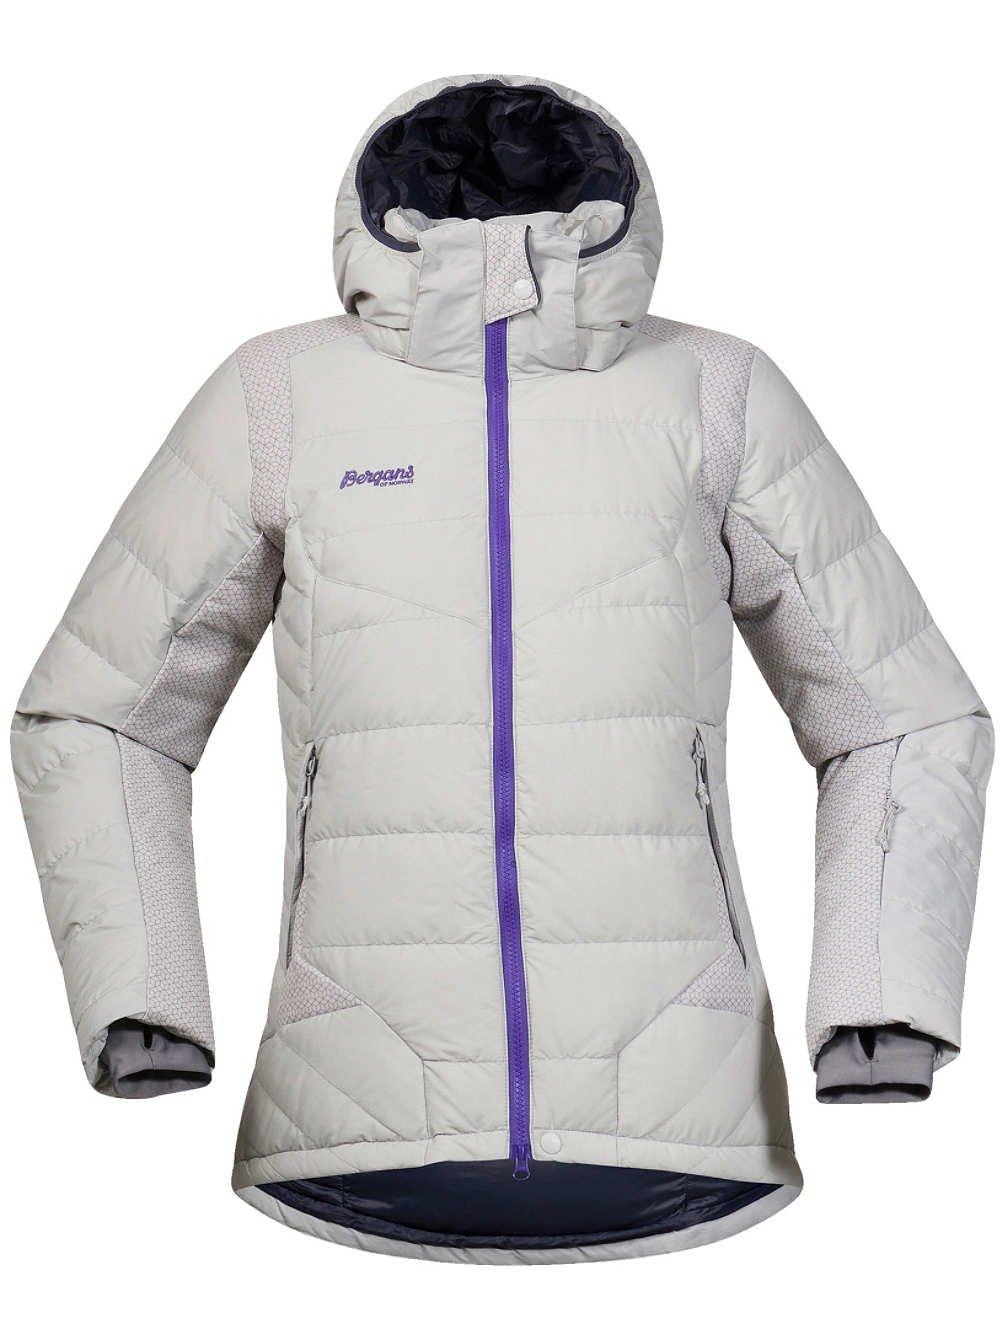 aedcf7eb02f Bergans Snow Jacket Women Rjukan Down Jacket: Amazon.co.uk: Sports &  Outdoors